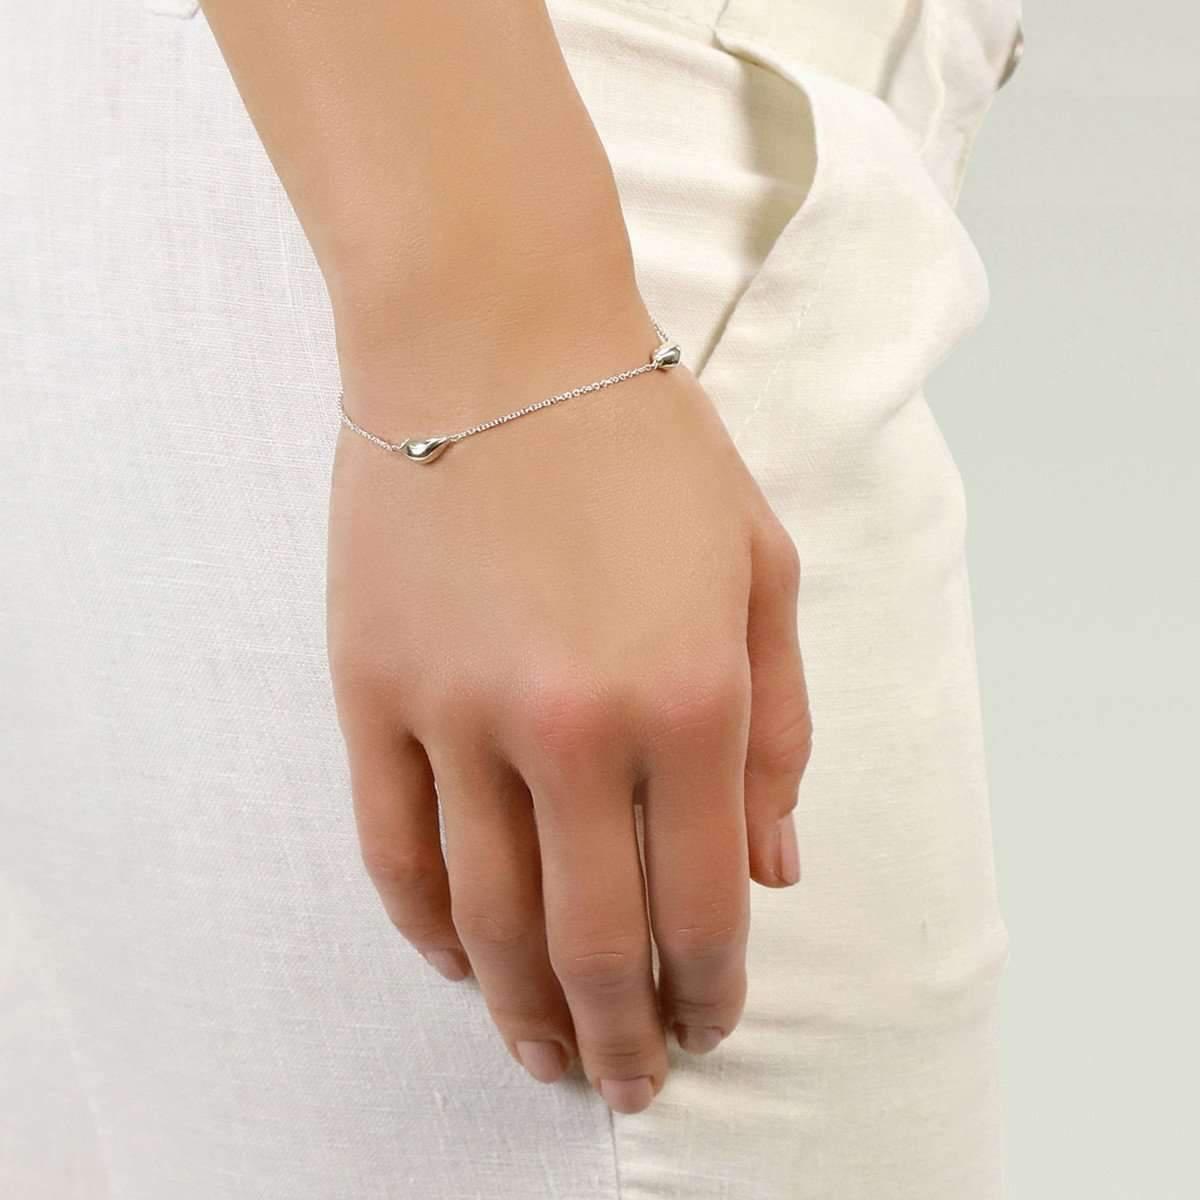 Jana Reinhardt Gold Plated Silver Tiny Sparrow Bracelet mDPkEyyR36